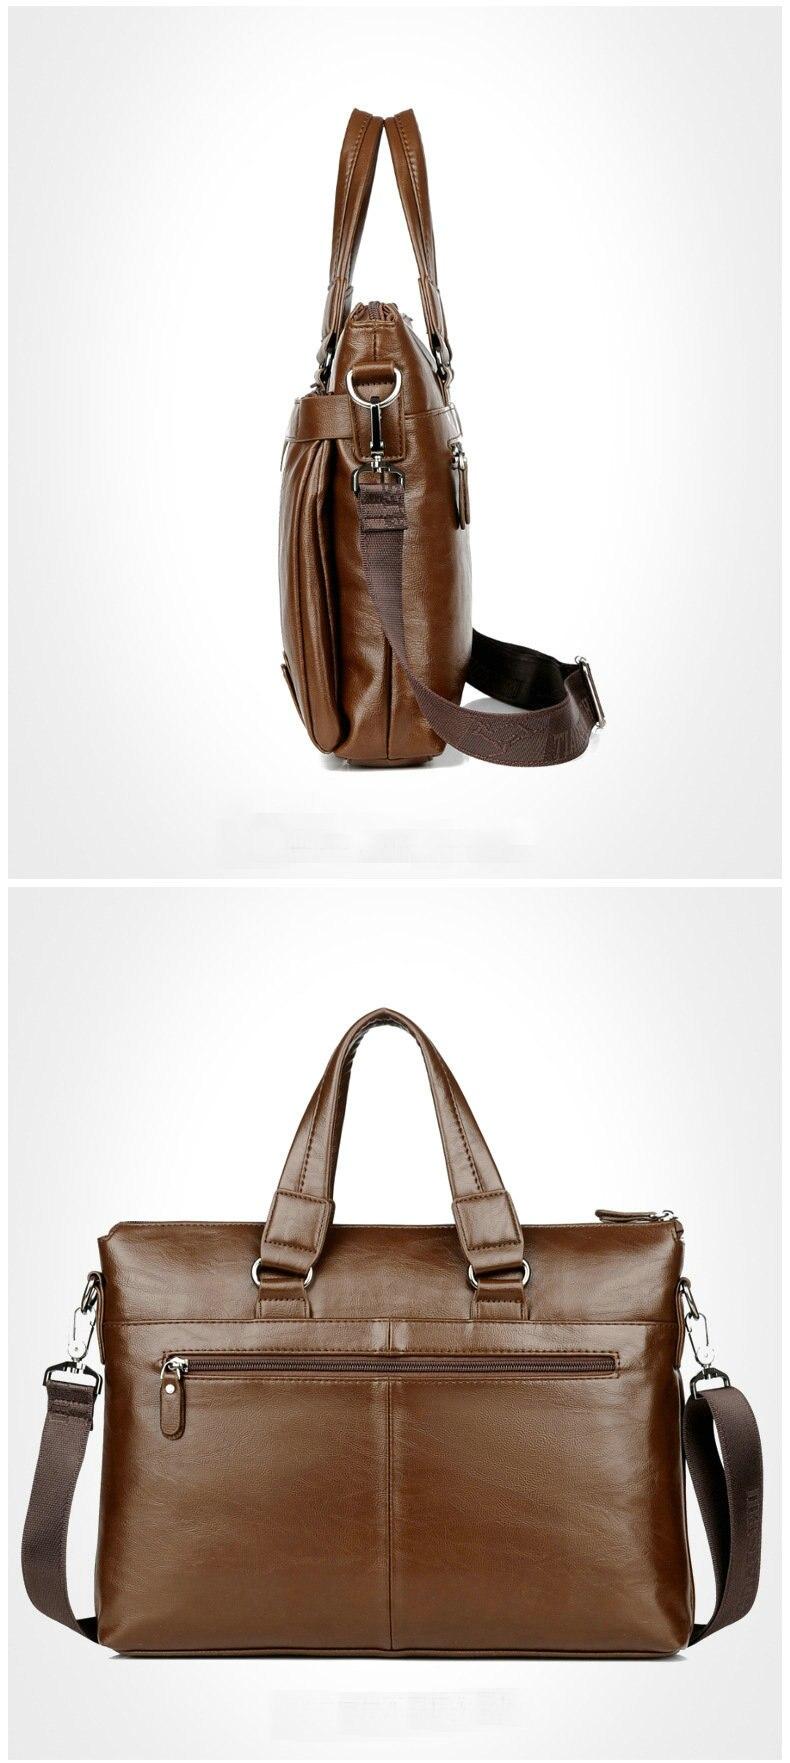 HTB1molBelWD3KVjSZKPq6yp7FXad Cowhide Leather men's Briefcase men laptop male messenger bag Men's shoulder bags briefcases for documents bag